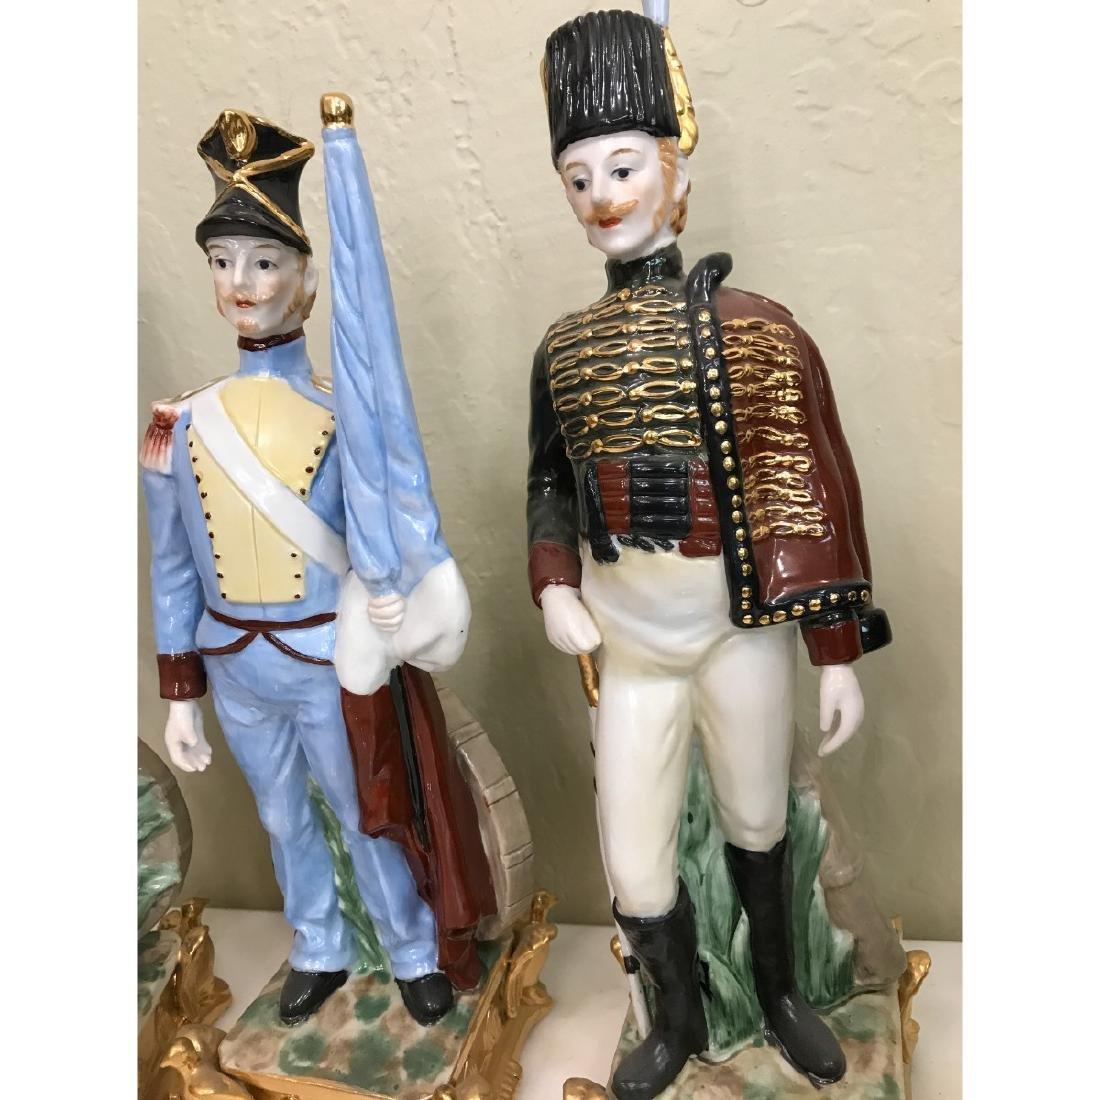 Set of 5 Porcelain Soldier Statues - 4